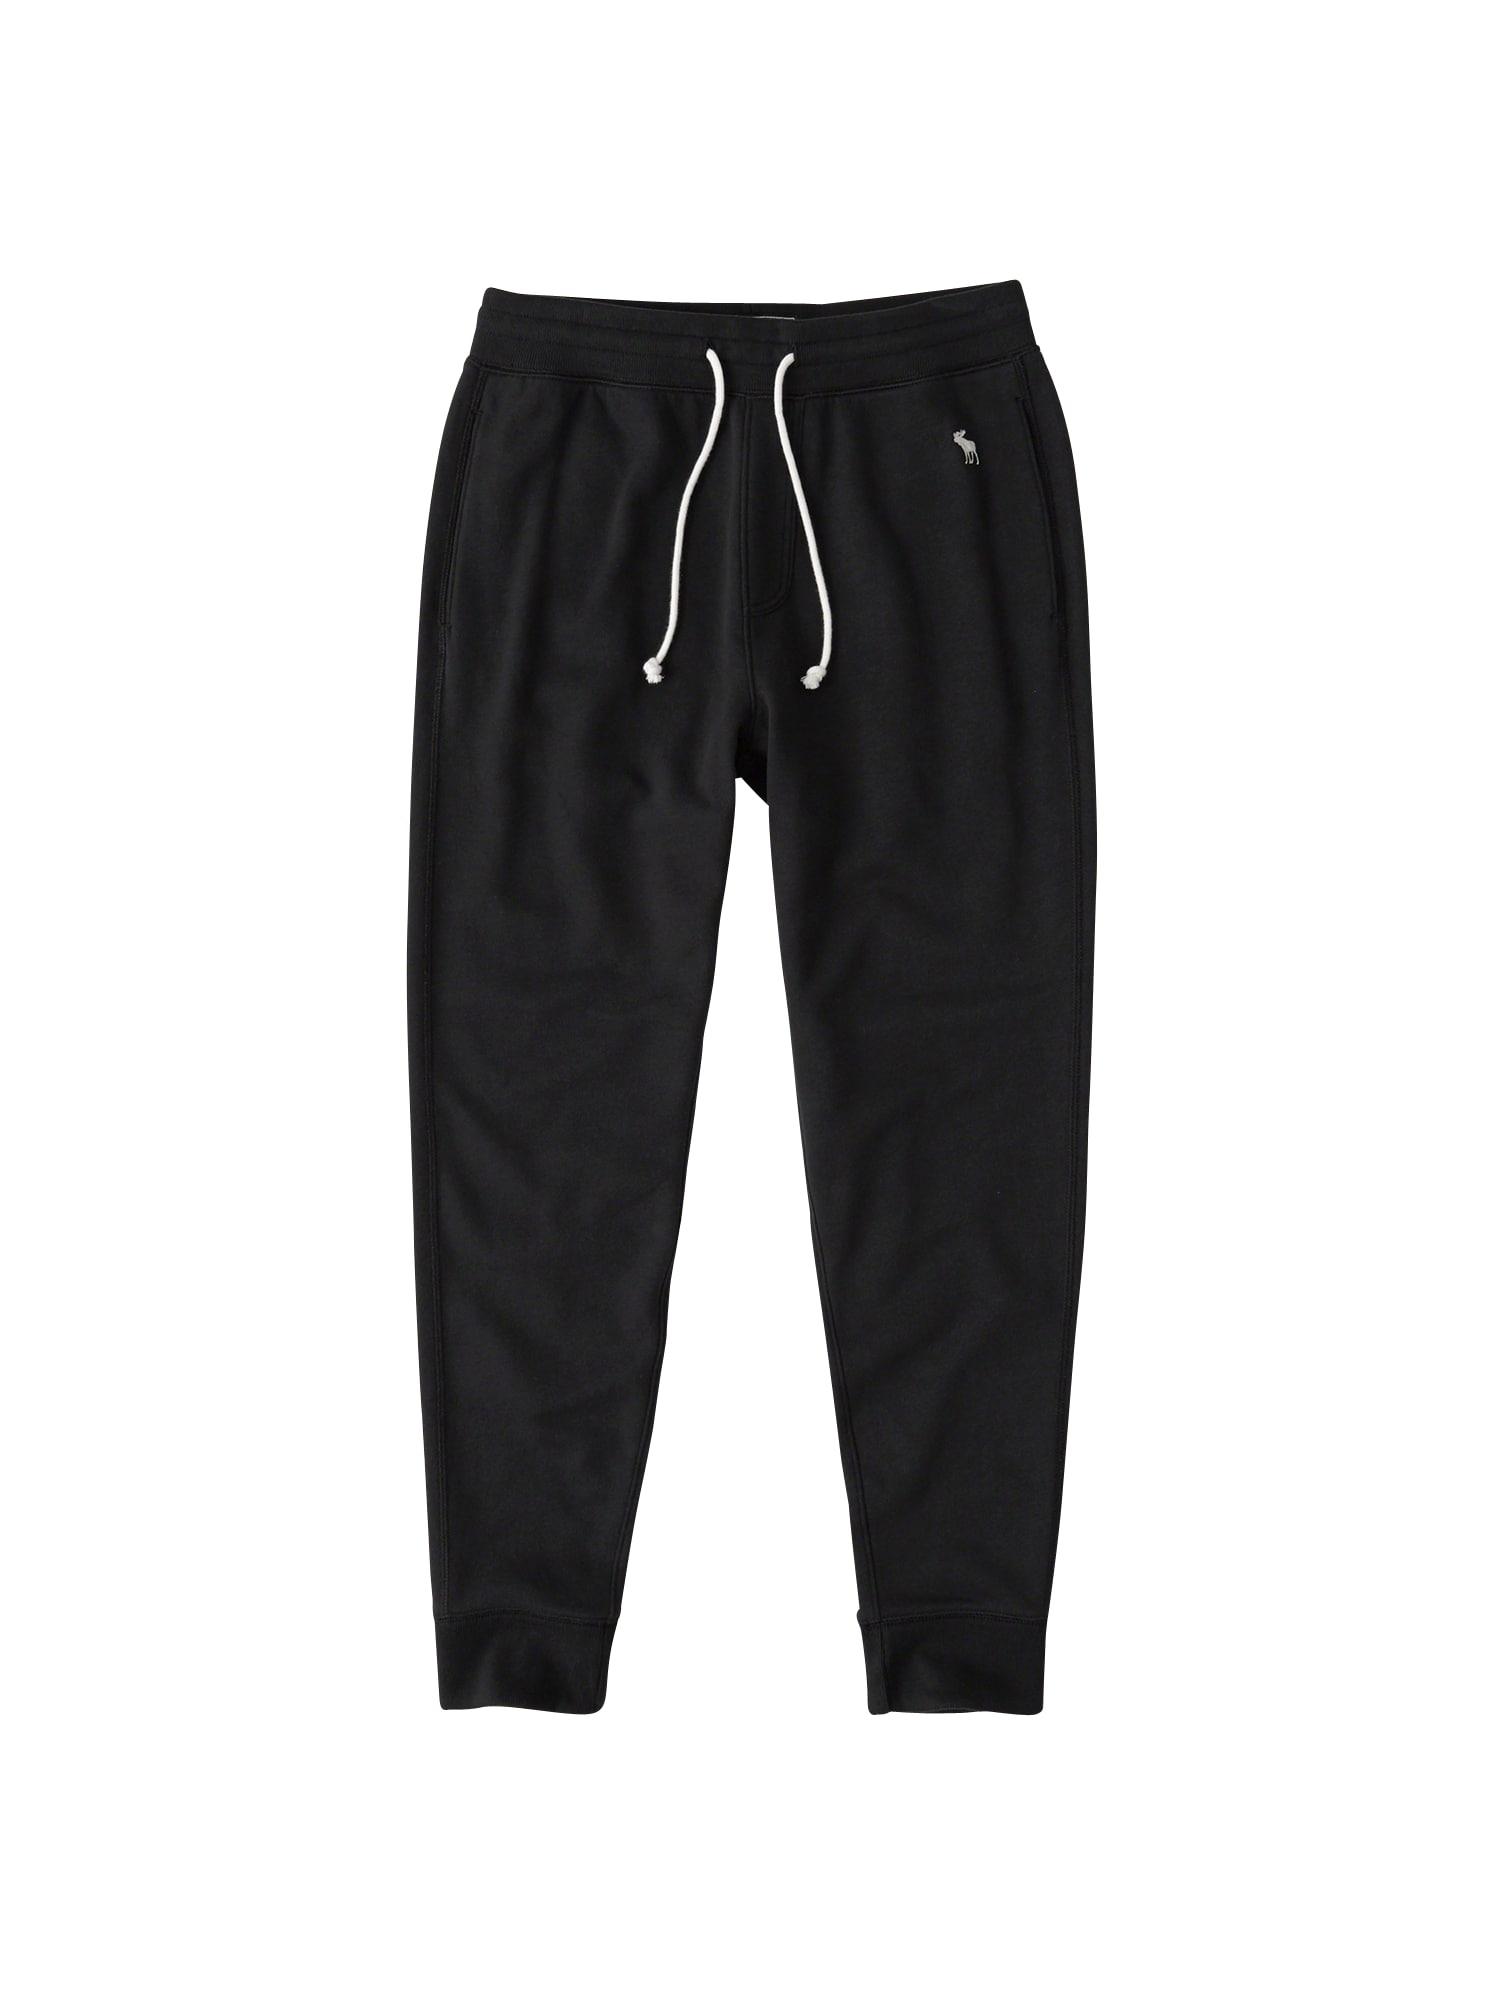 Kalhoty ESSENTIAL JOGGER GLOBAL DTC 4CC černá Abercrombie & Fitch